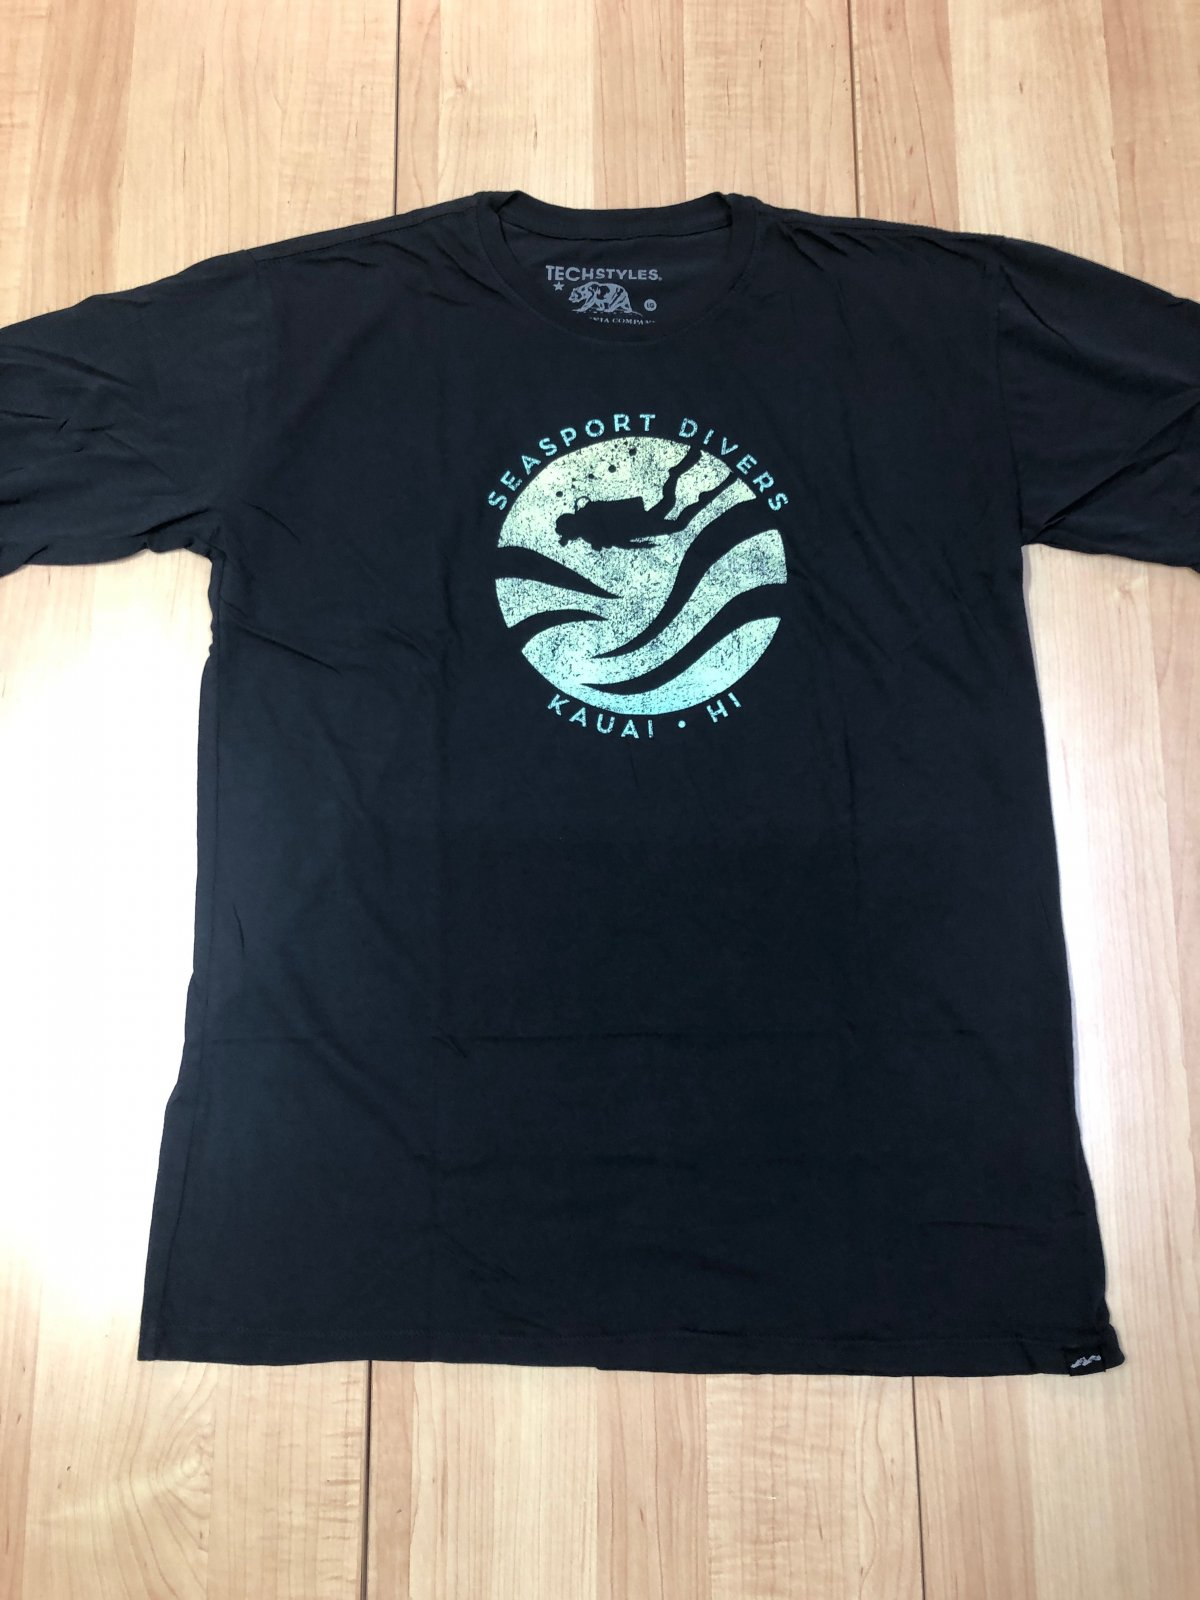 Periscope Diver T-shirt